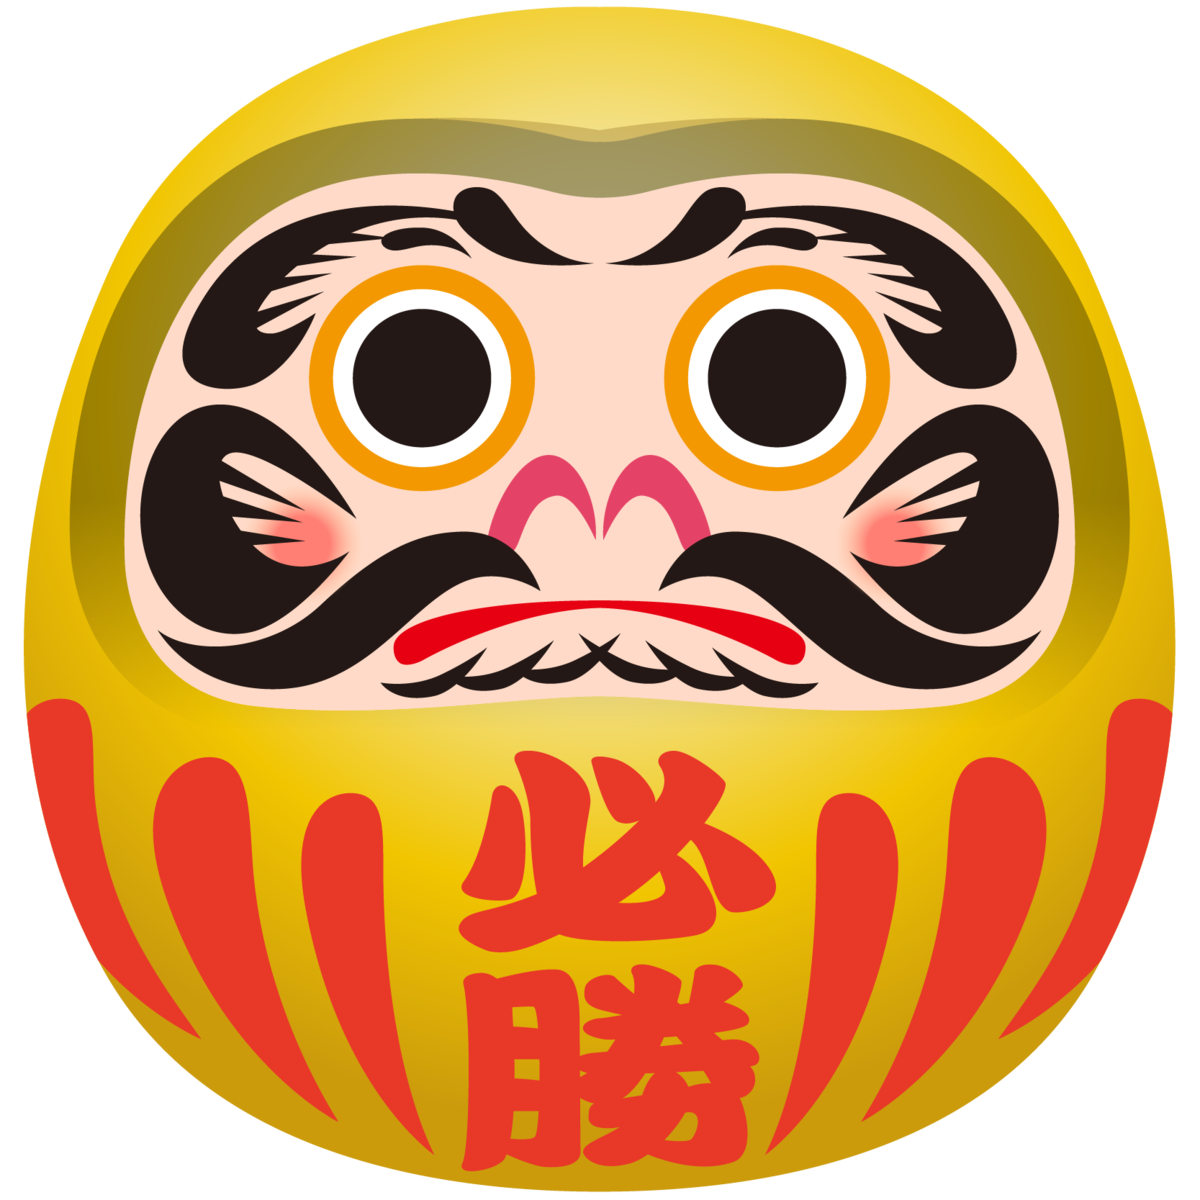 f:id:kokosuki22:20190617035906p:plain